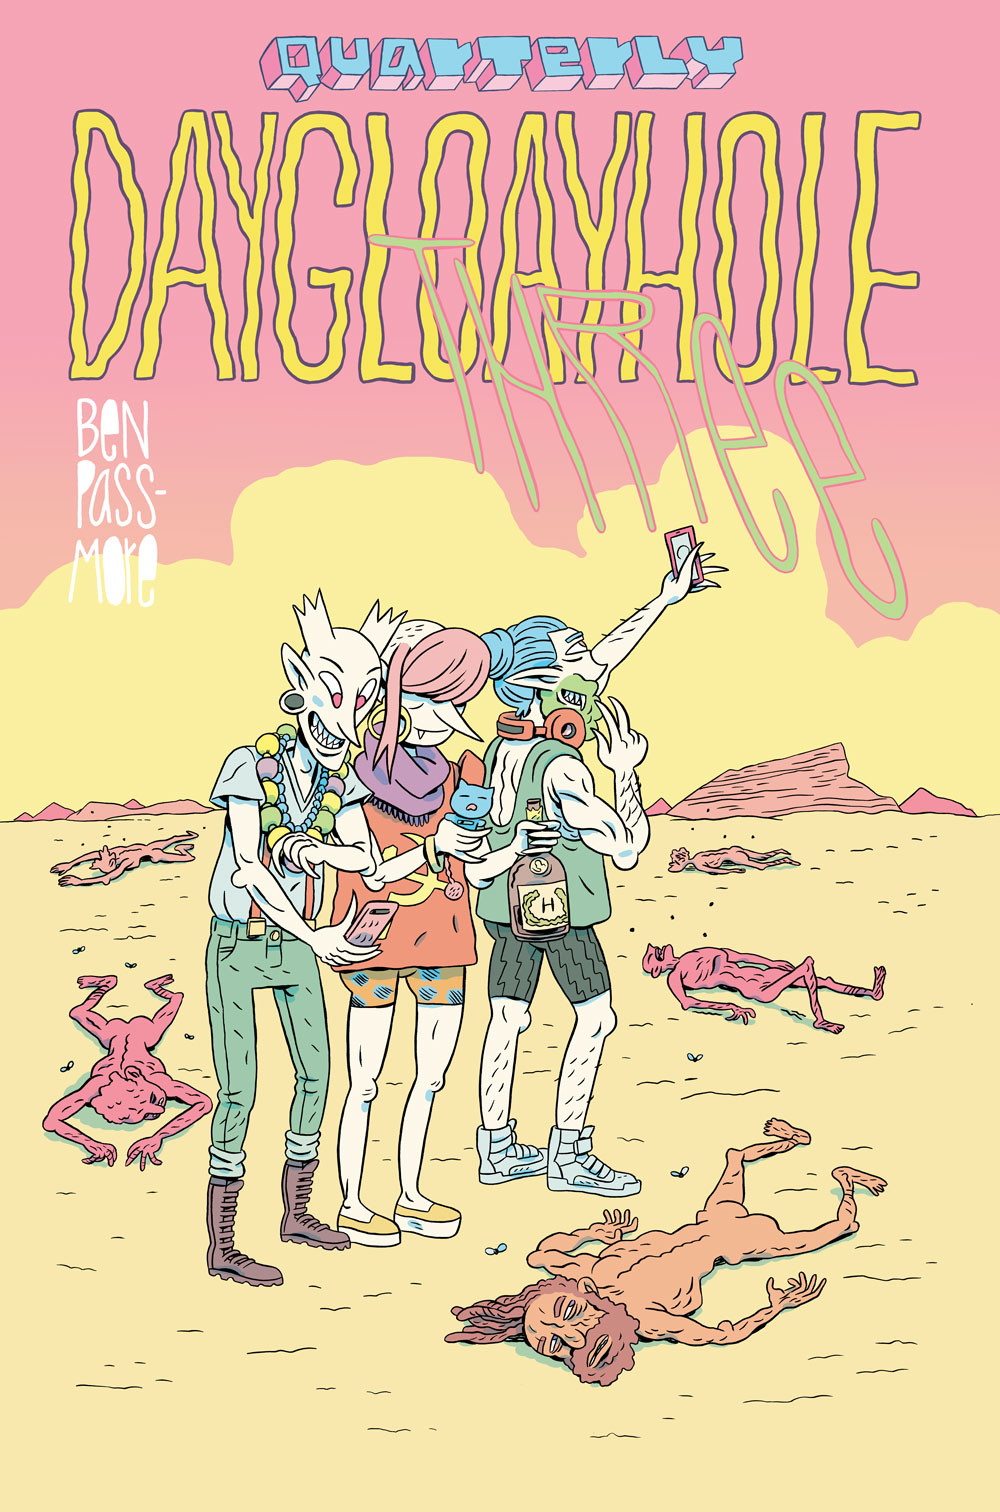 Daygloayhole 3